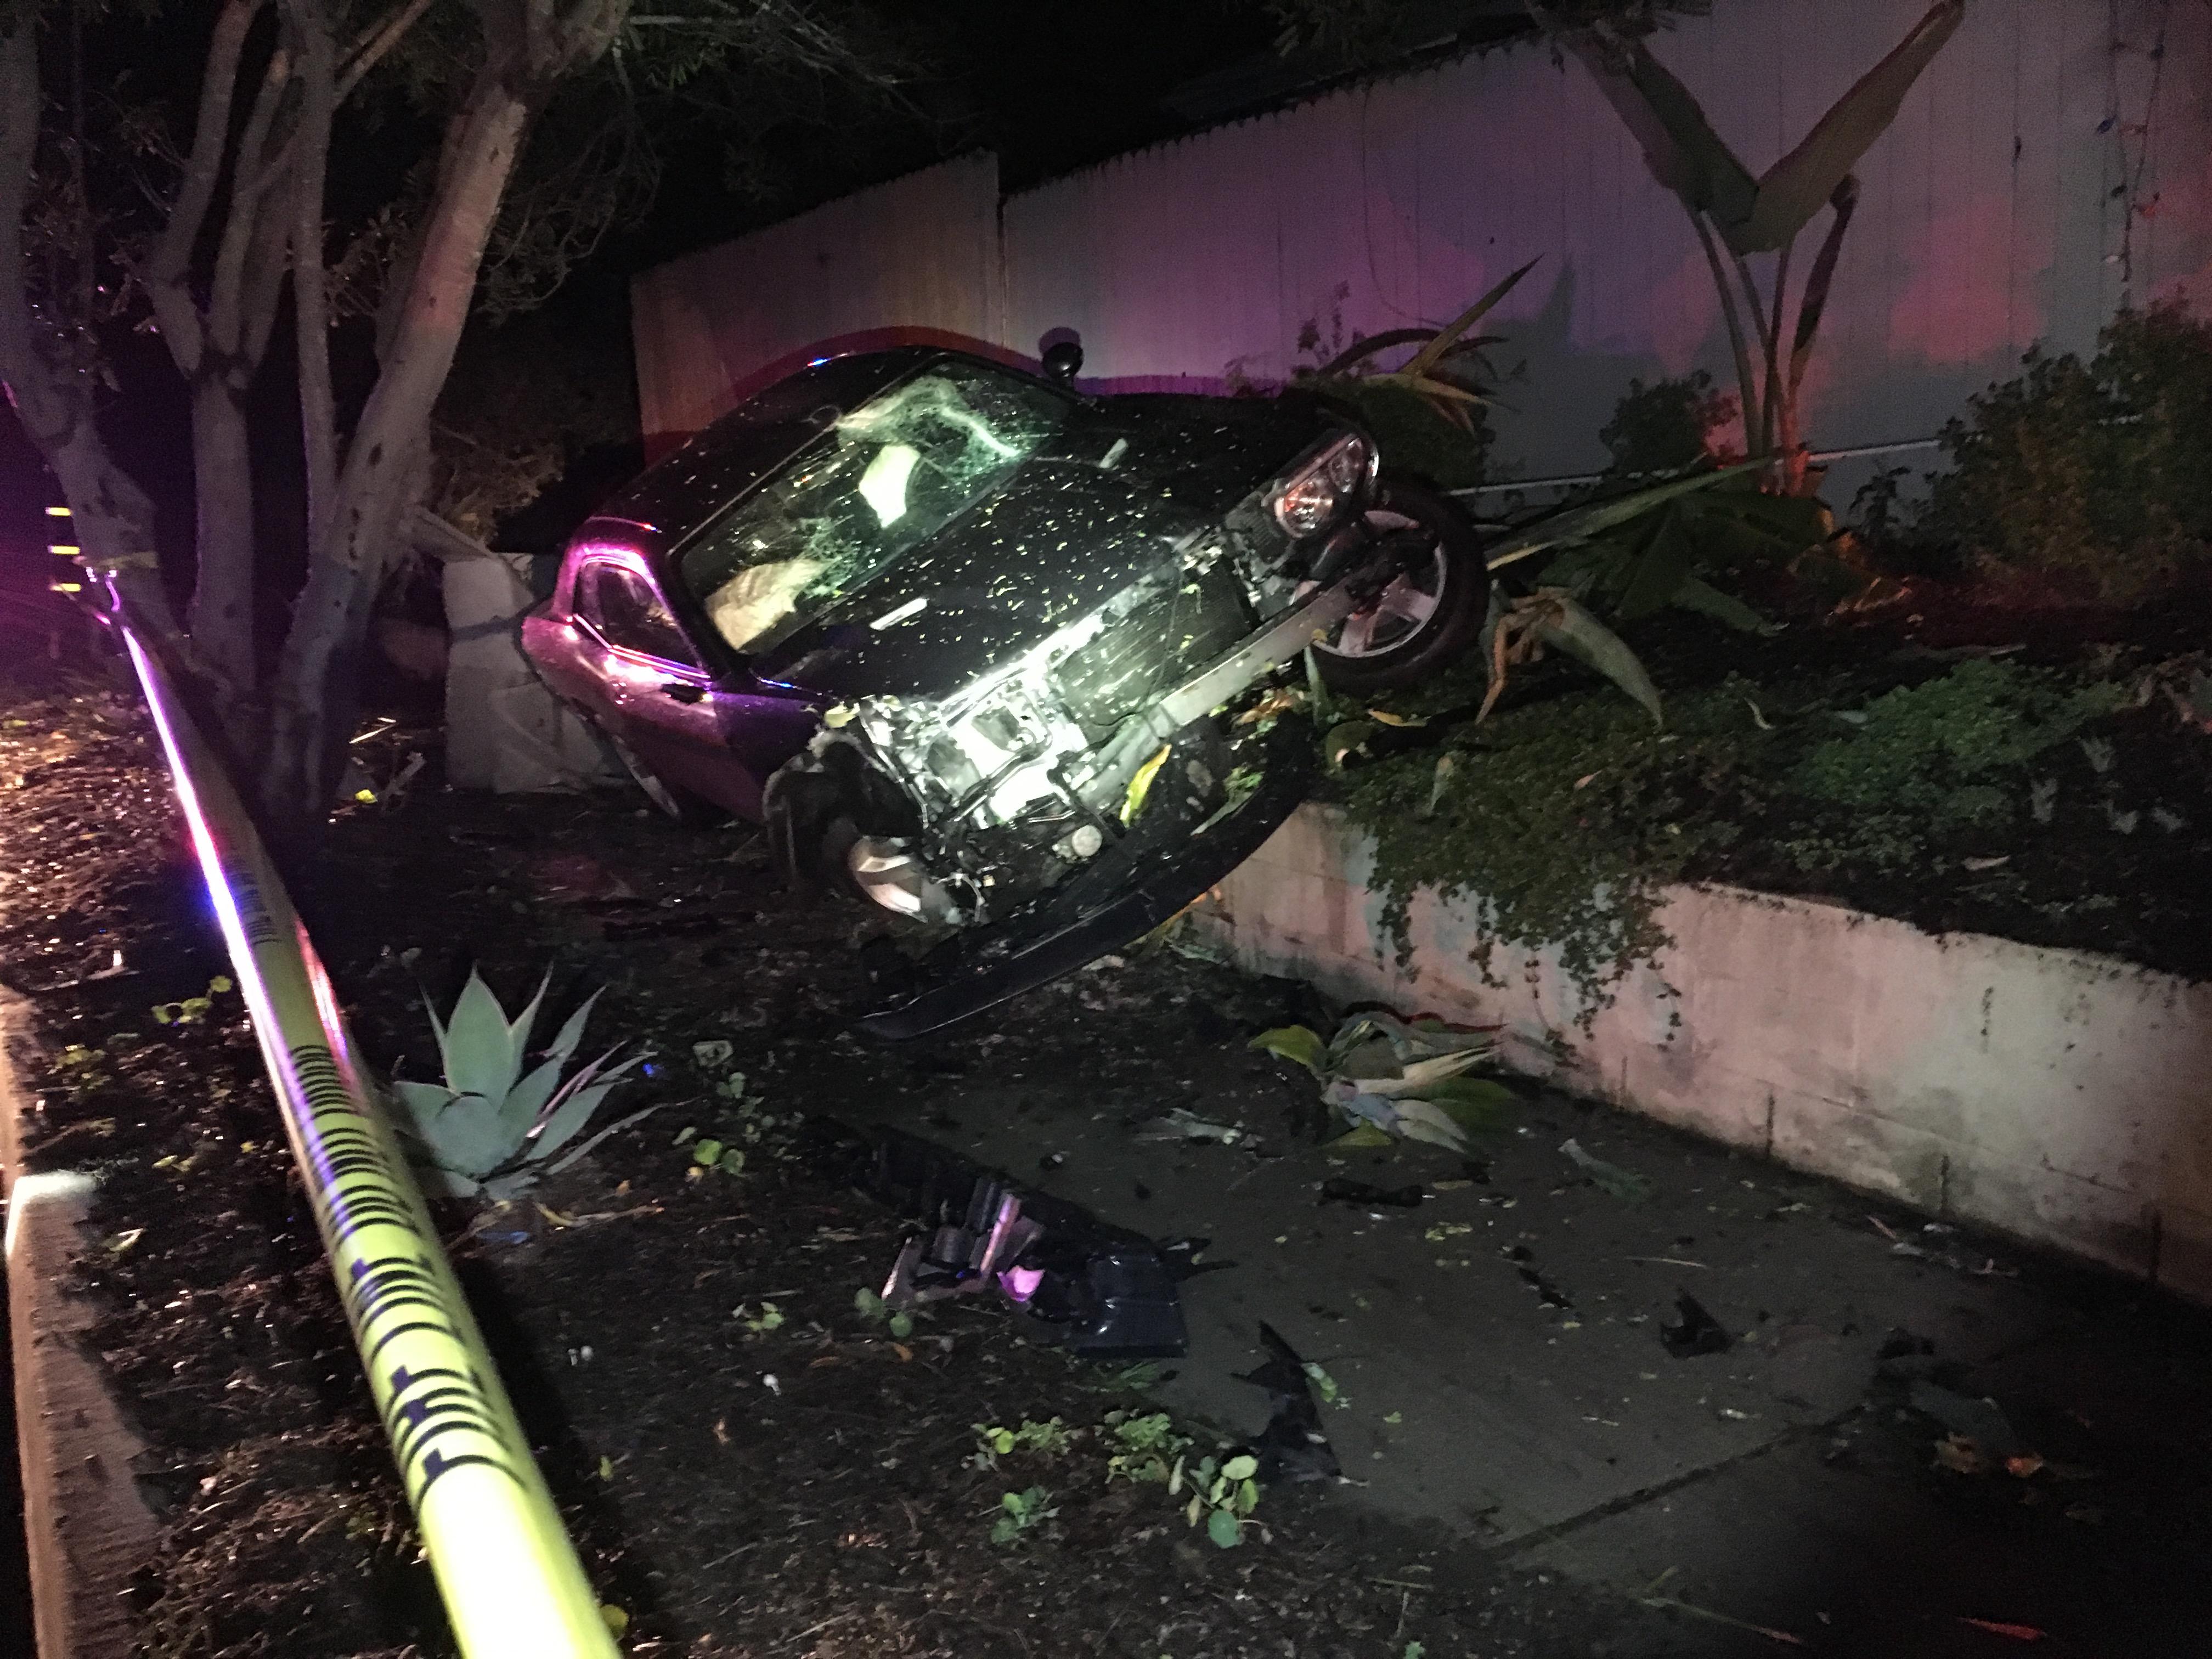 Car Crash Puts Lights Out in Goleta - The Santa Barbara